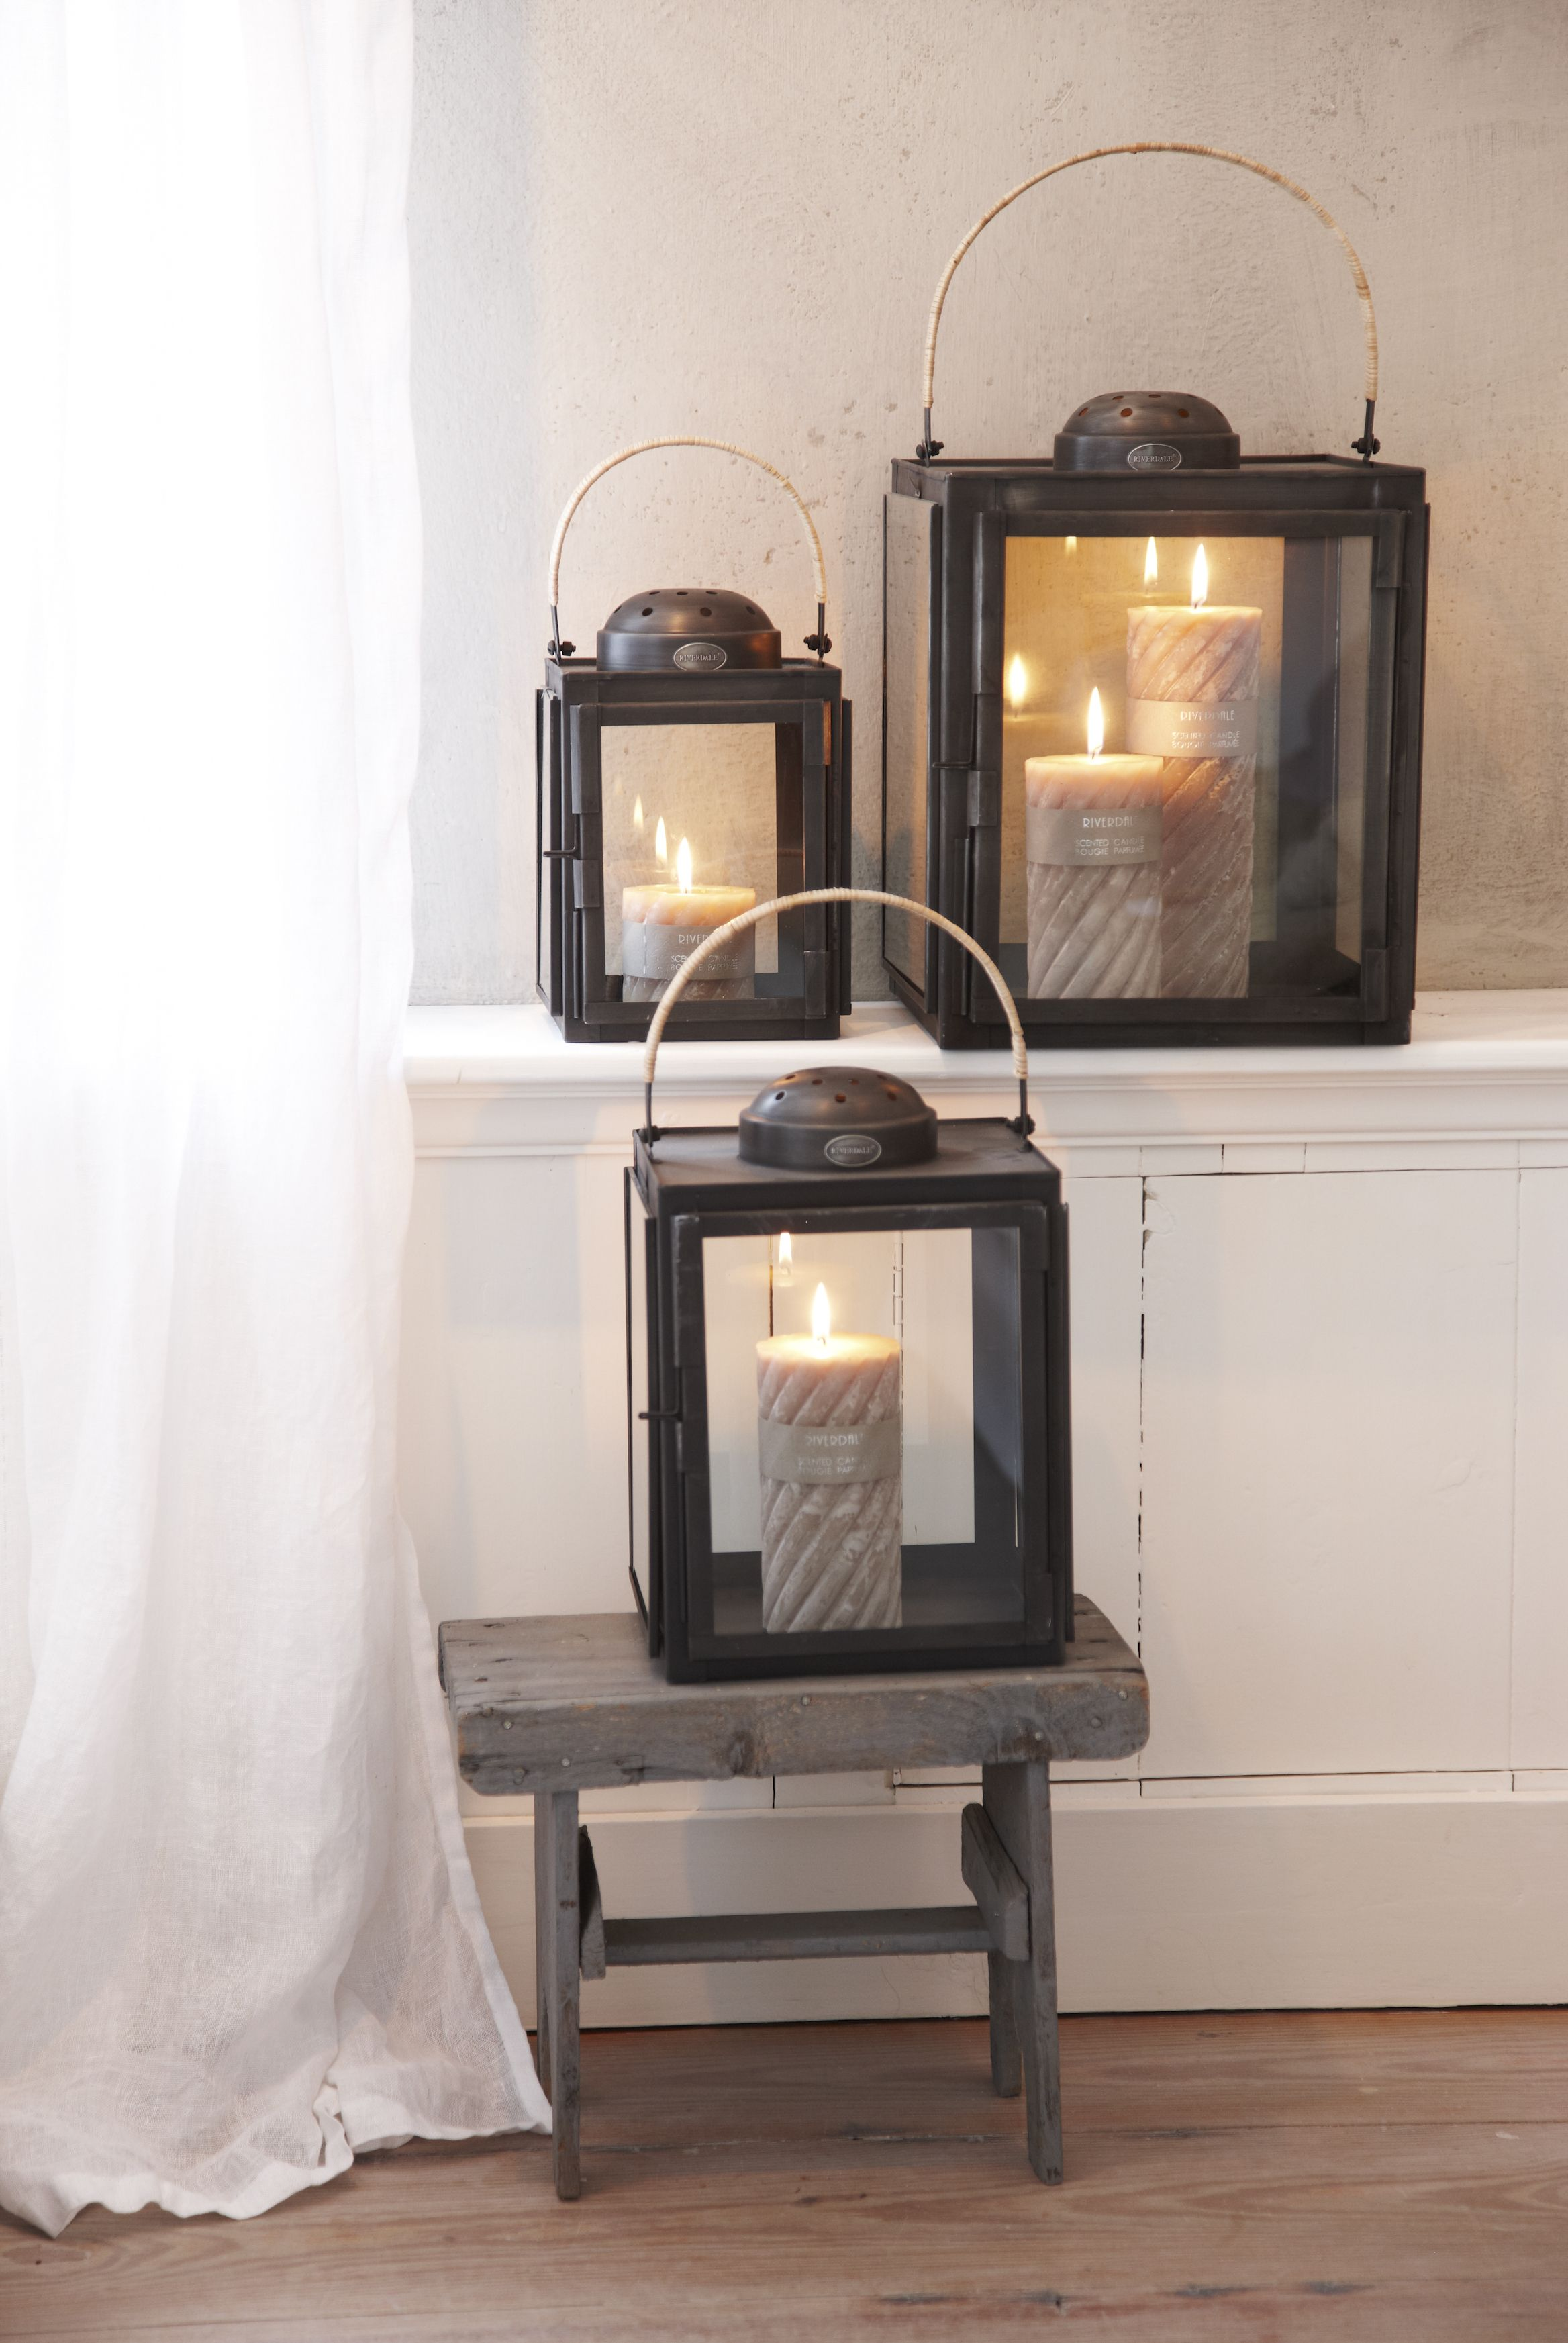 Riverdale lantern luci candele e lanterne lanterns candle lanterns e candles - Idee decoro casa ...